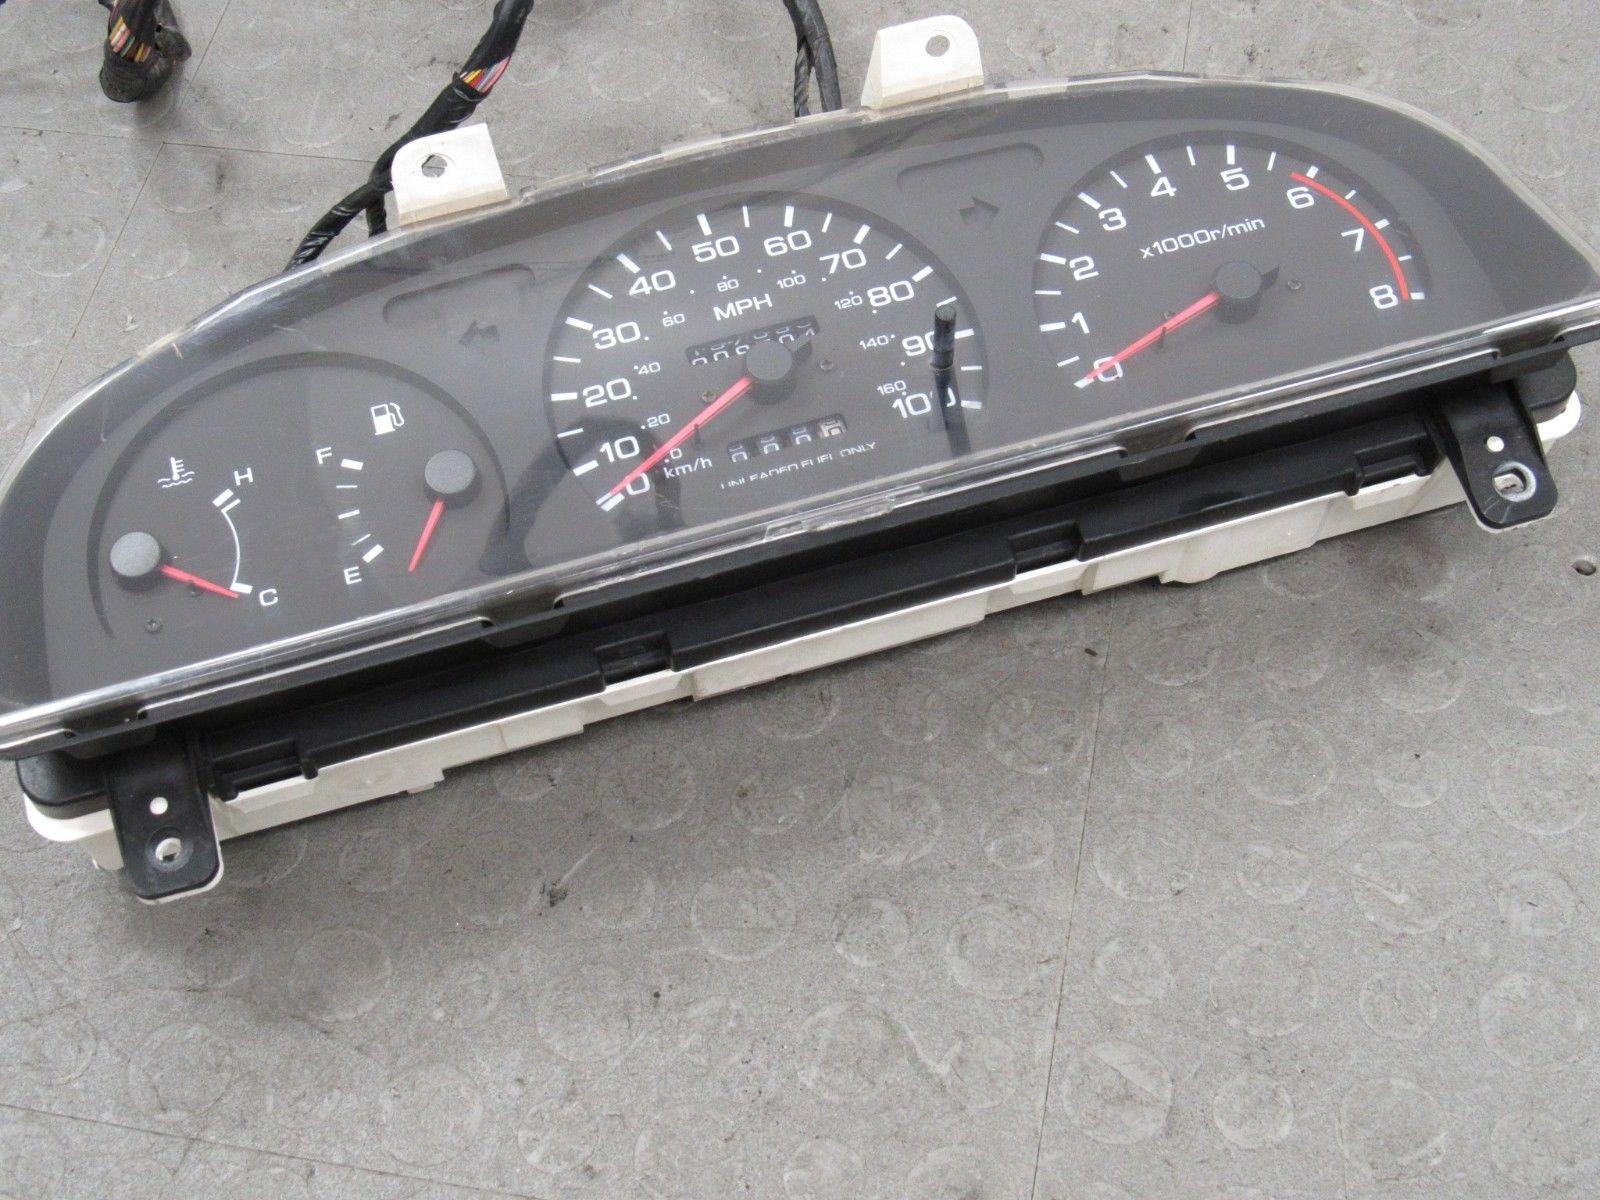 94-97 Nissan Pickup Truck Hard Body Instrument Gauge Cluster Tach Harness  208704